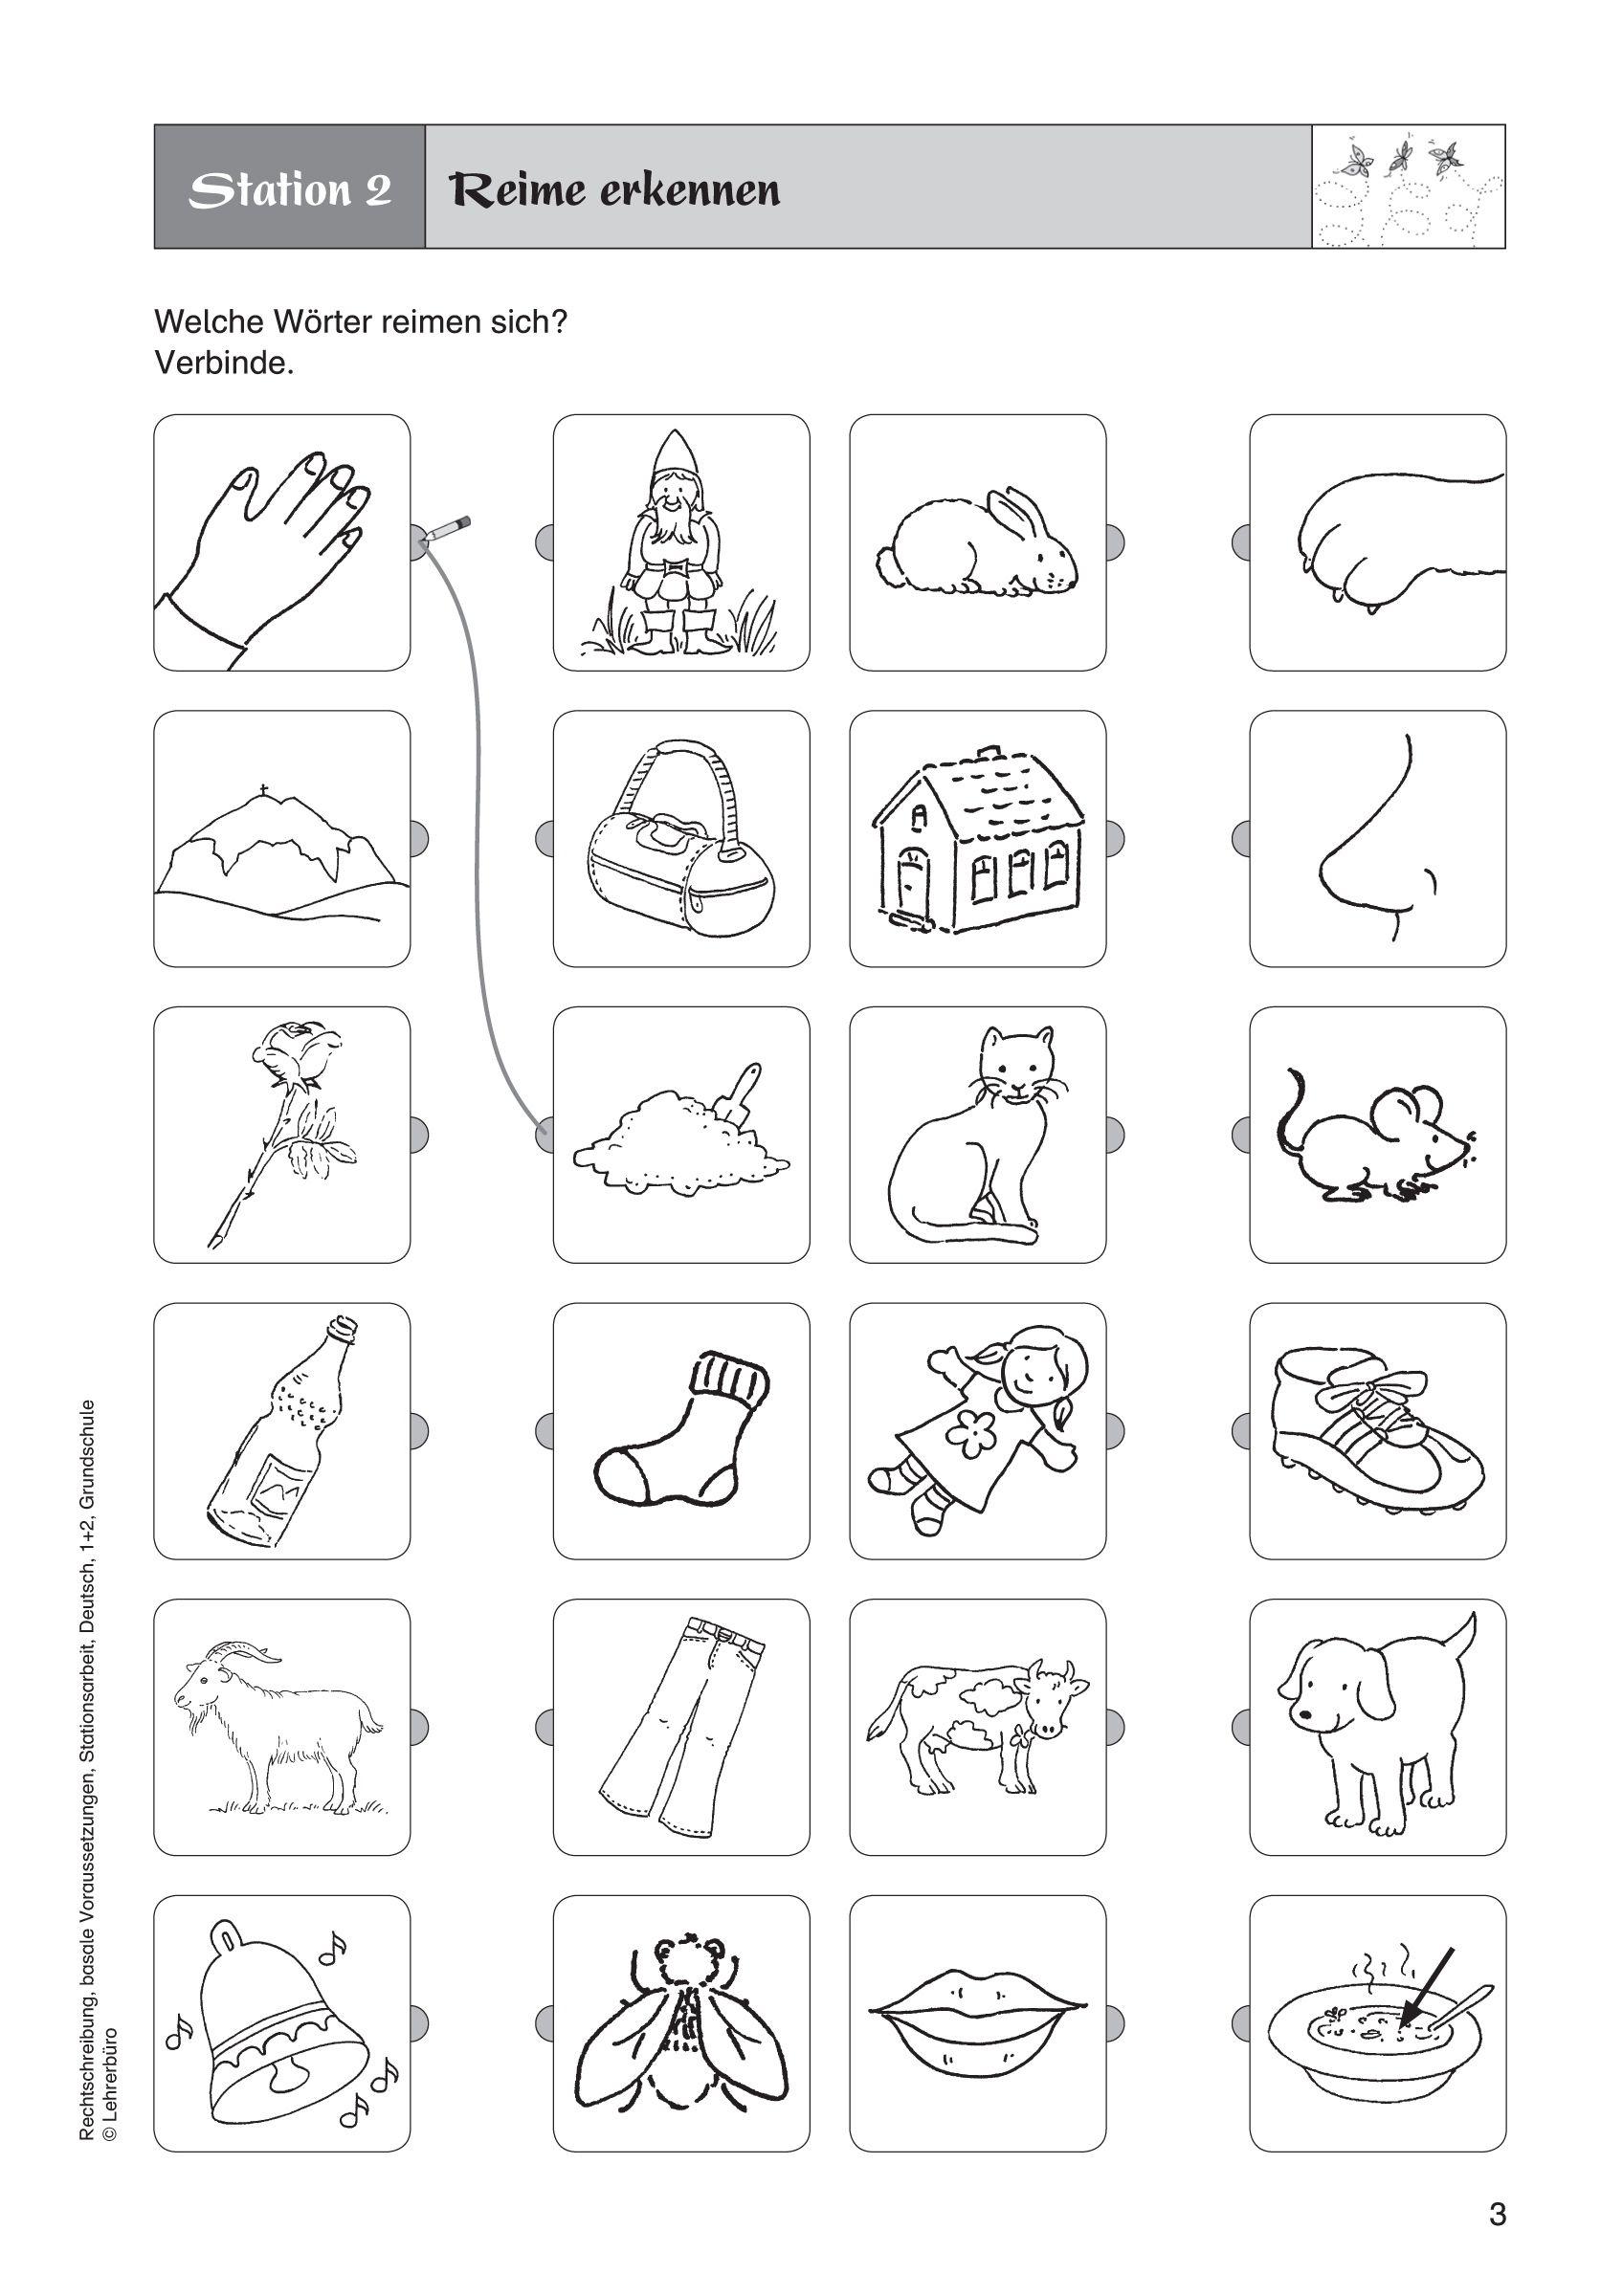 Arbeitsblätter Grundschule 1 Klasse Ausdrucken 1 Klasse ganzes Arbeitsblätter Deutsch 1 Klasse